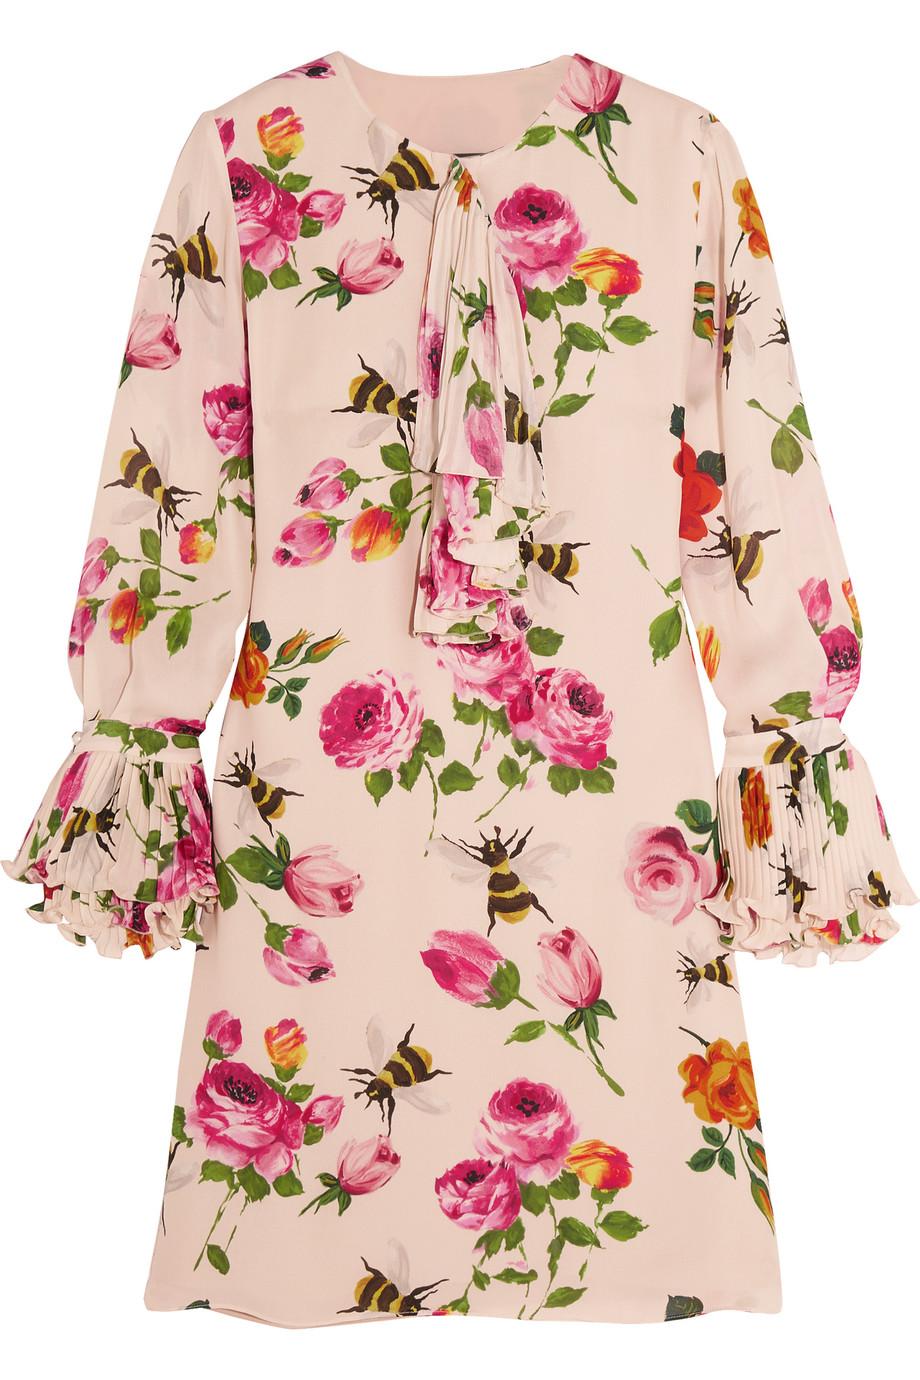 Gucci Ruffled Printed Silk Crepe De Chine Mini Dress, Ivory/Pink, Women's - Printed, Size: 38